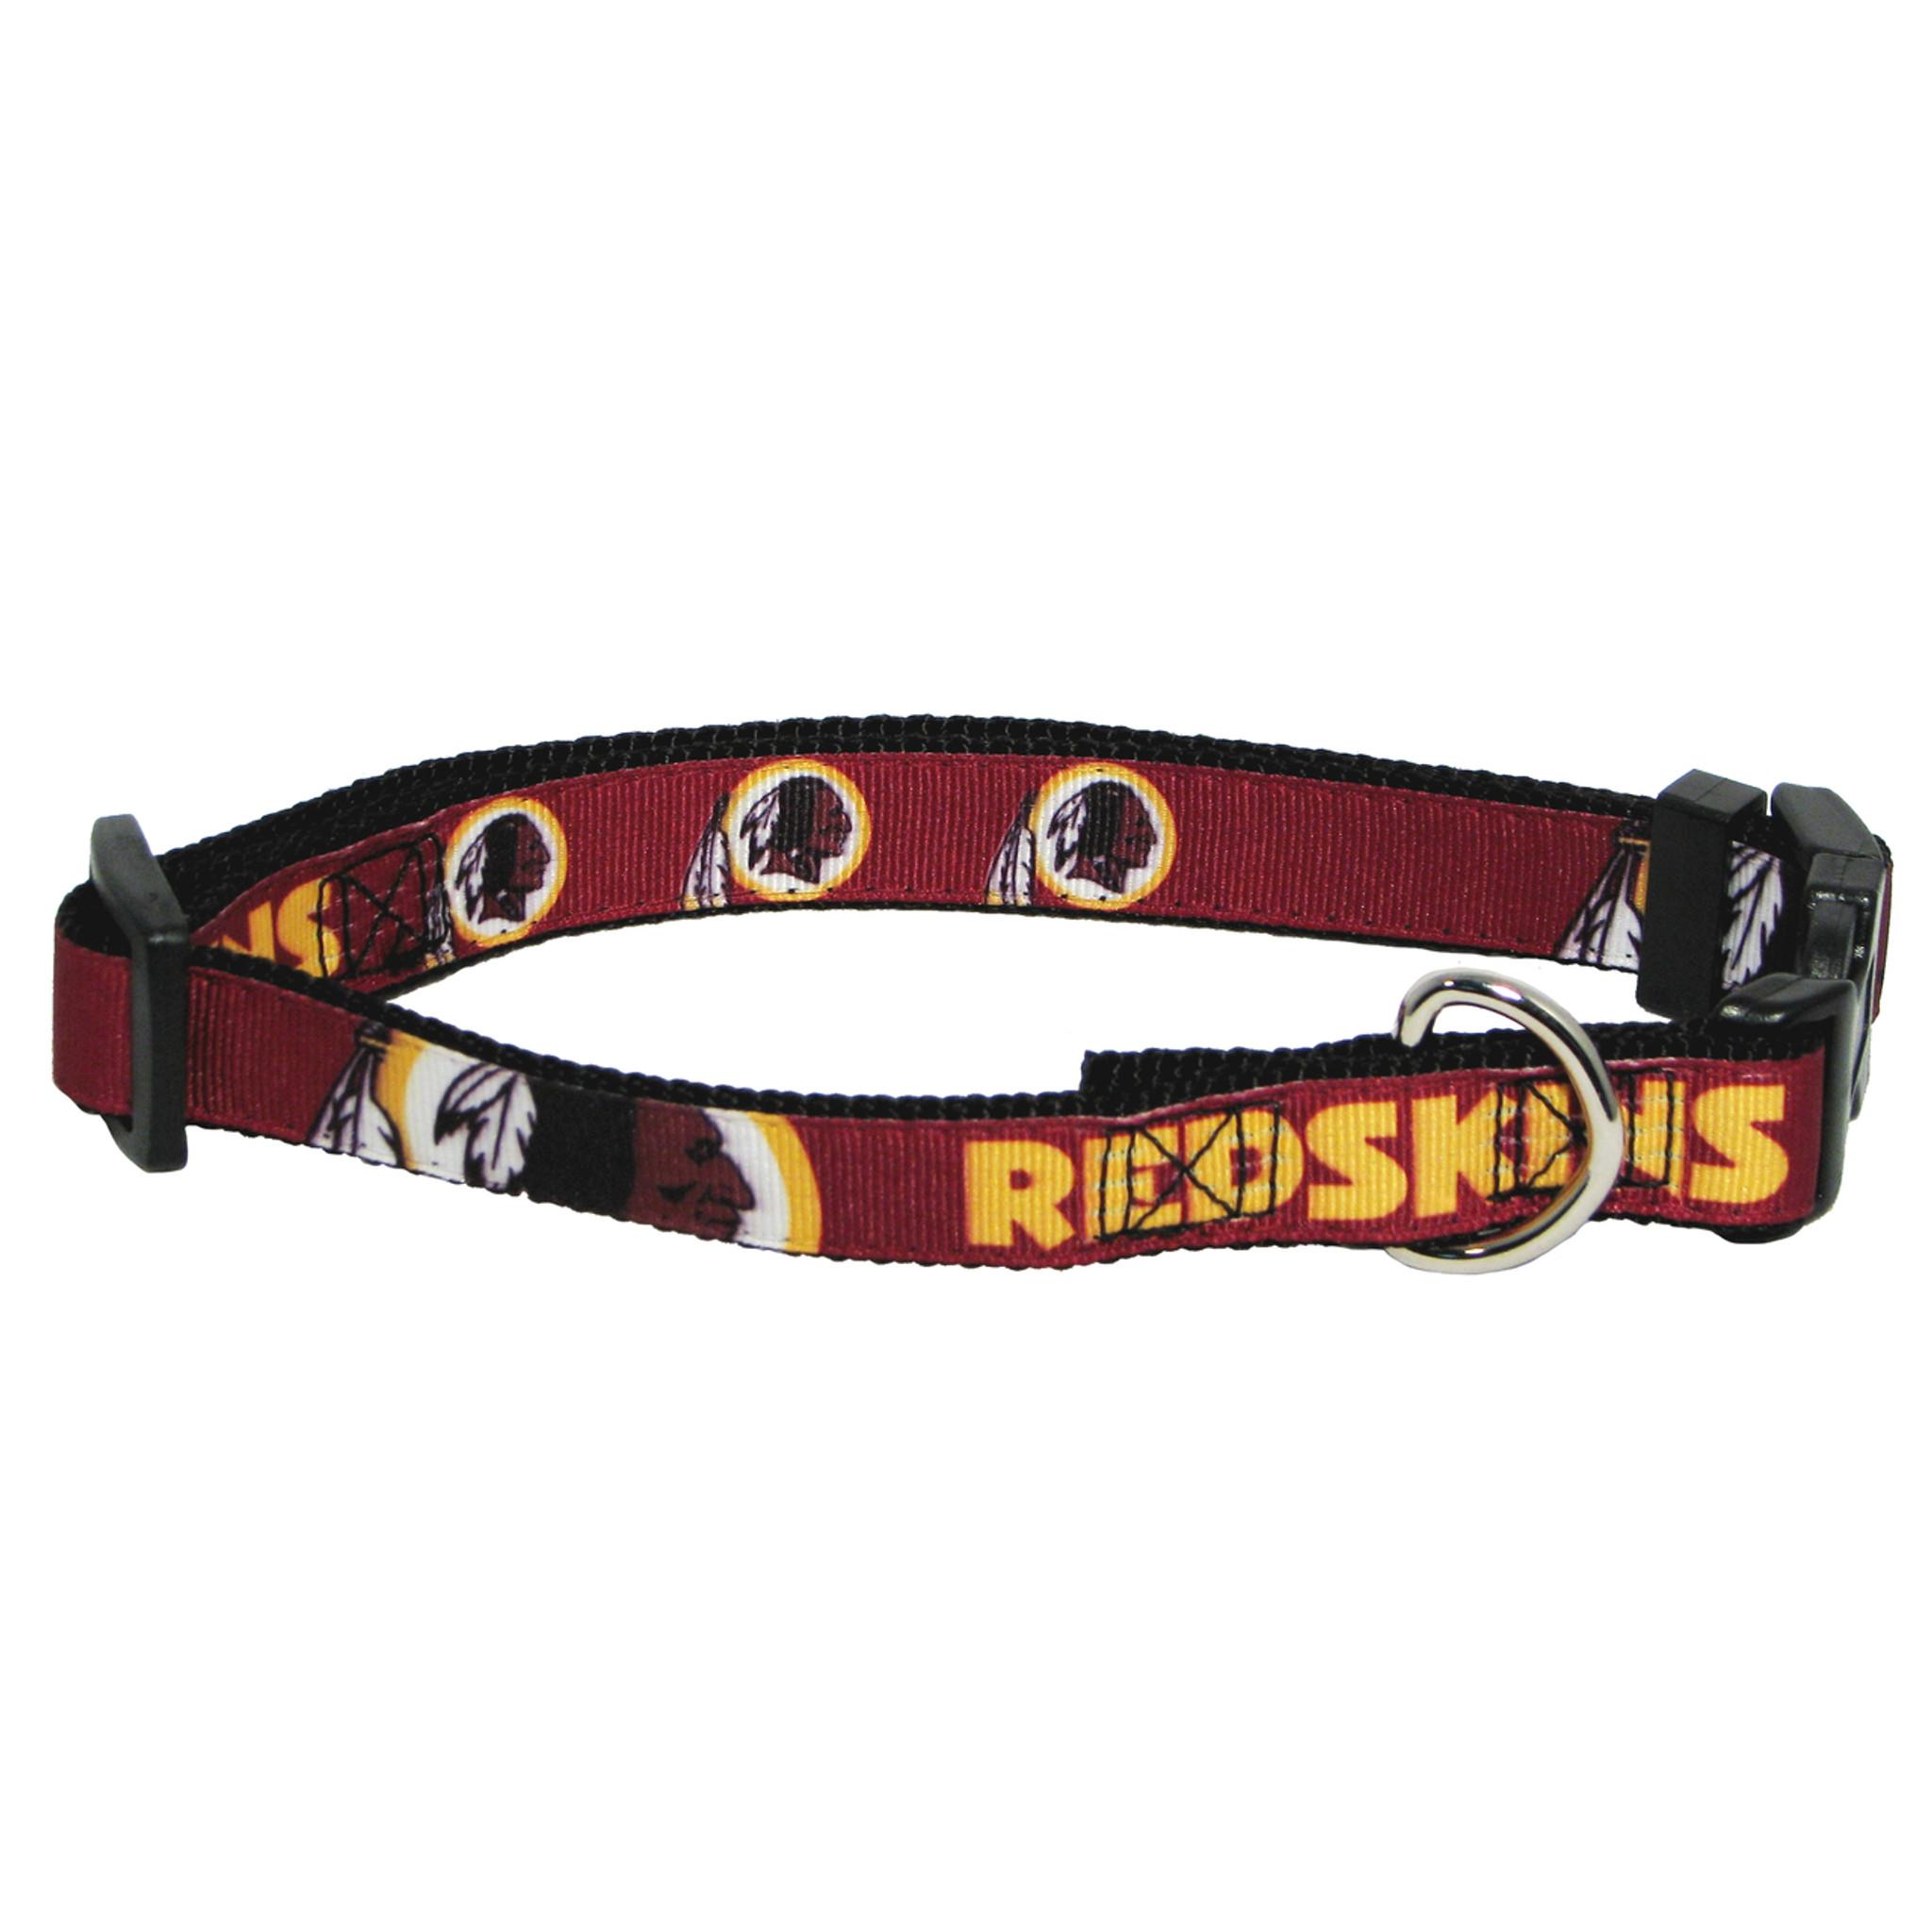 9ba917ac6 Washington Redskins Dog Pet Premium Adjustable Nylon Collar - Spawty